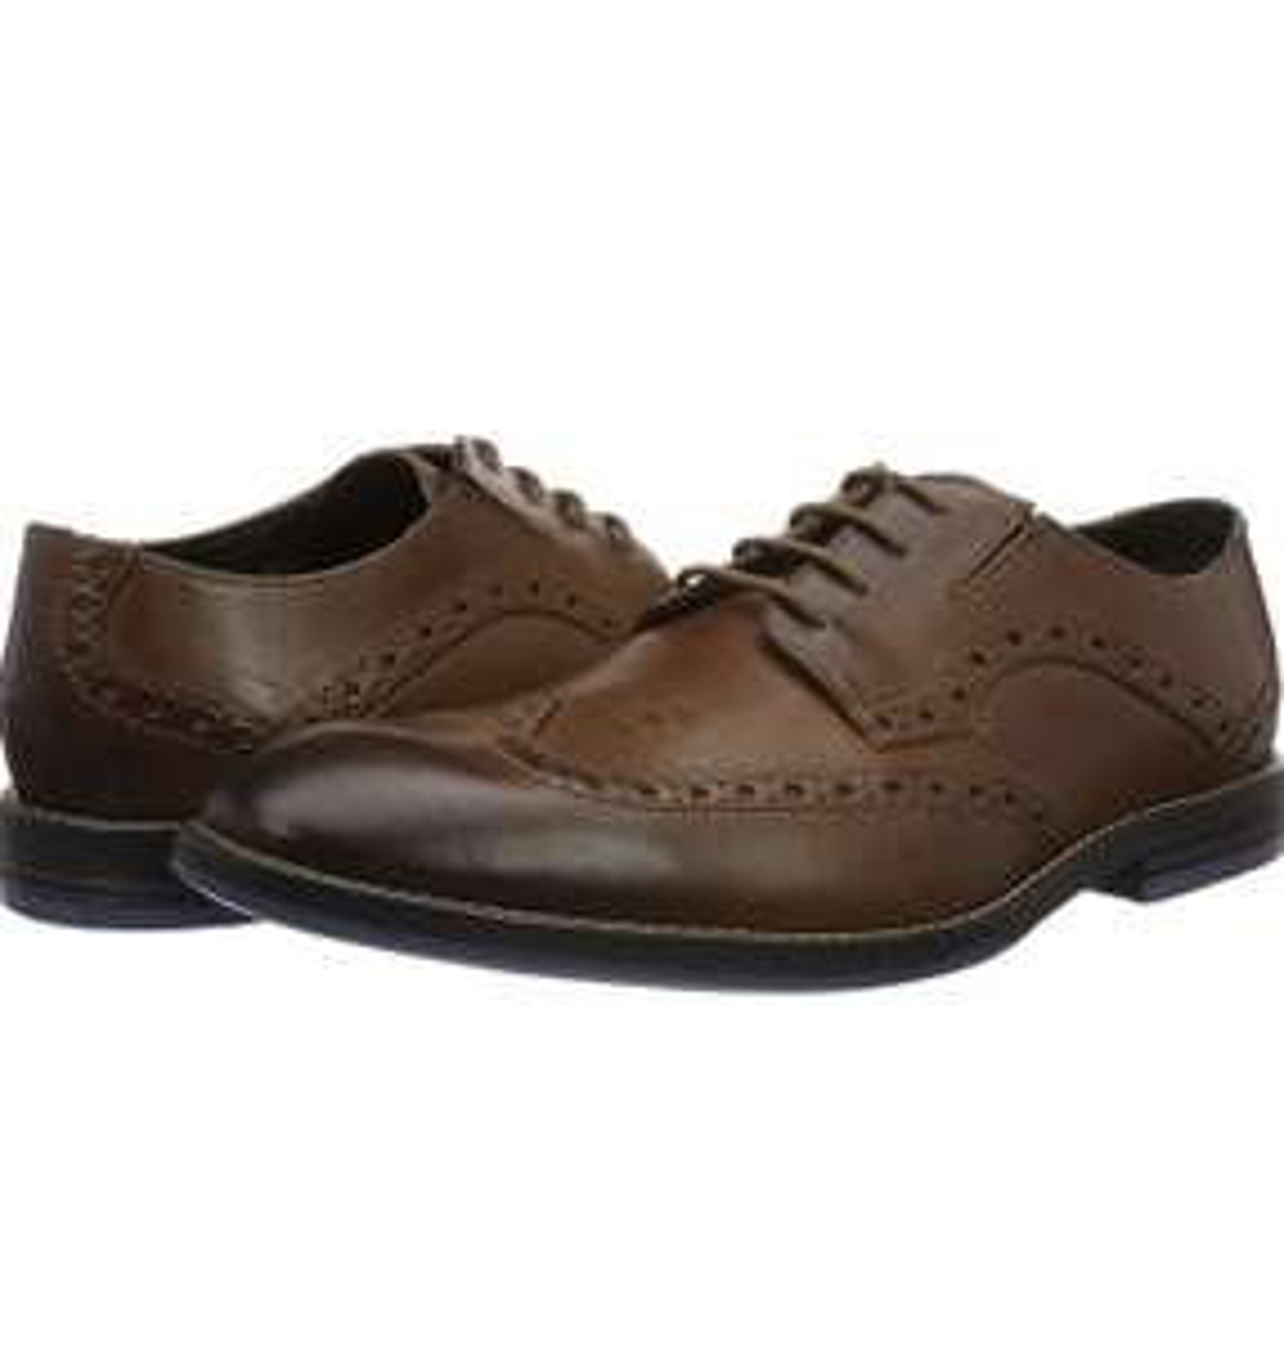 Clarks Men's Prangley Limit Leather Ortholite Brogues Size 10 - £17.02 prime / £21.51 nonprime at Amazon